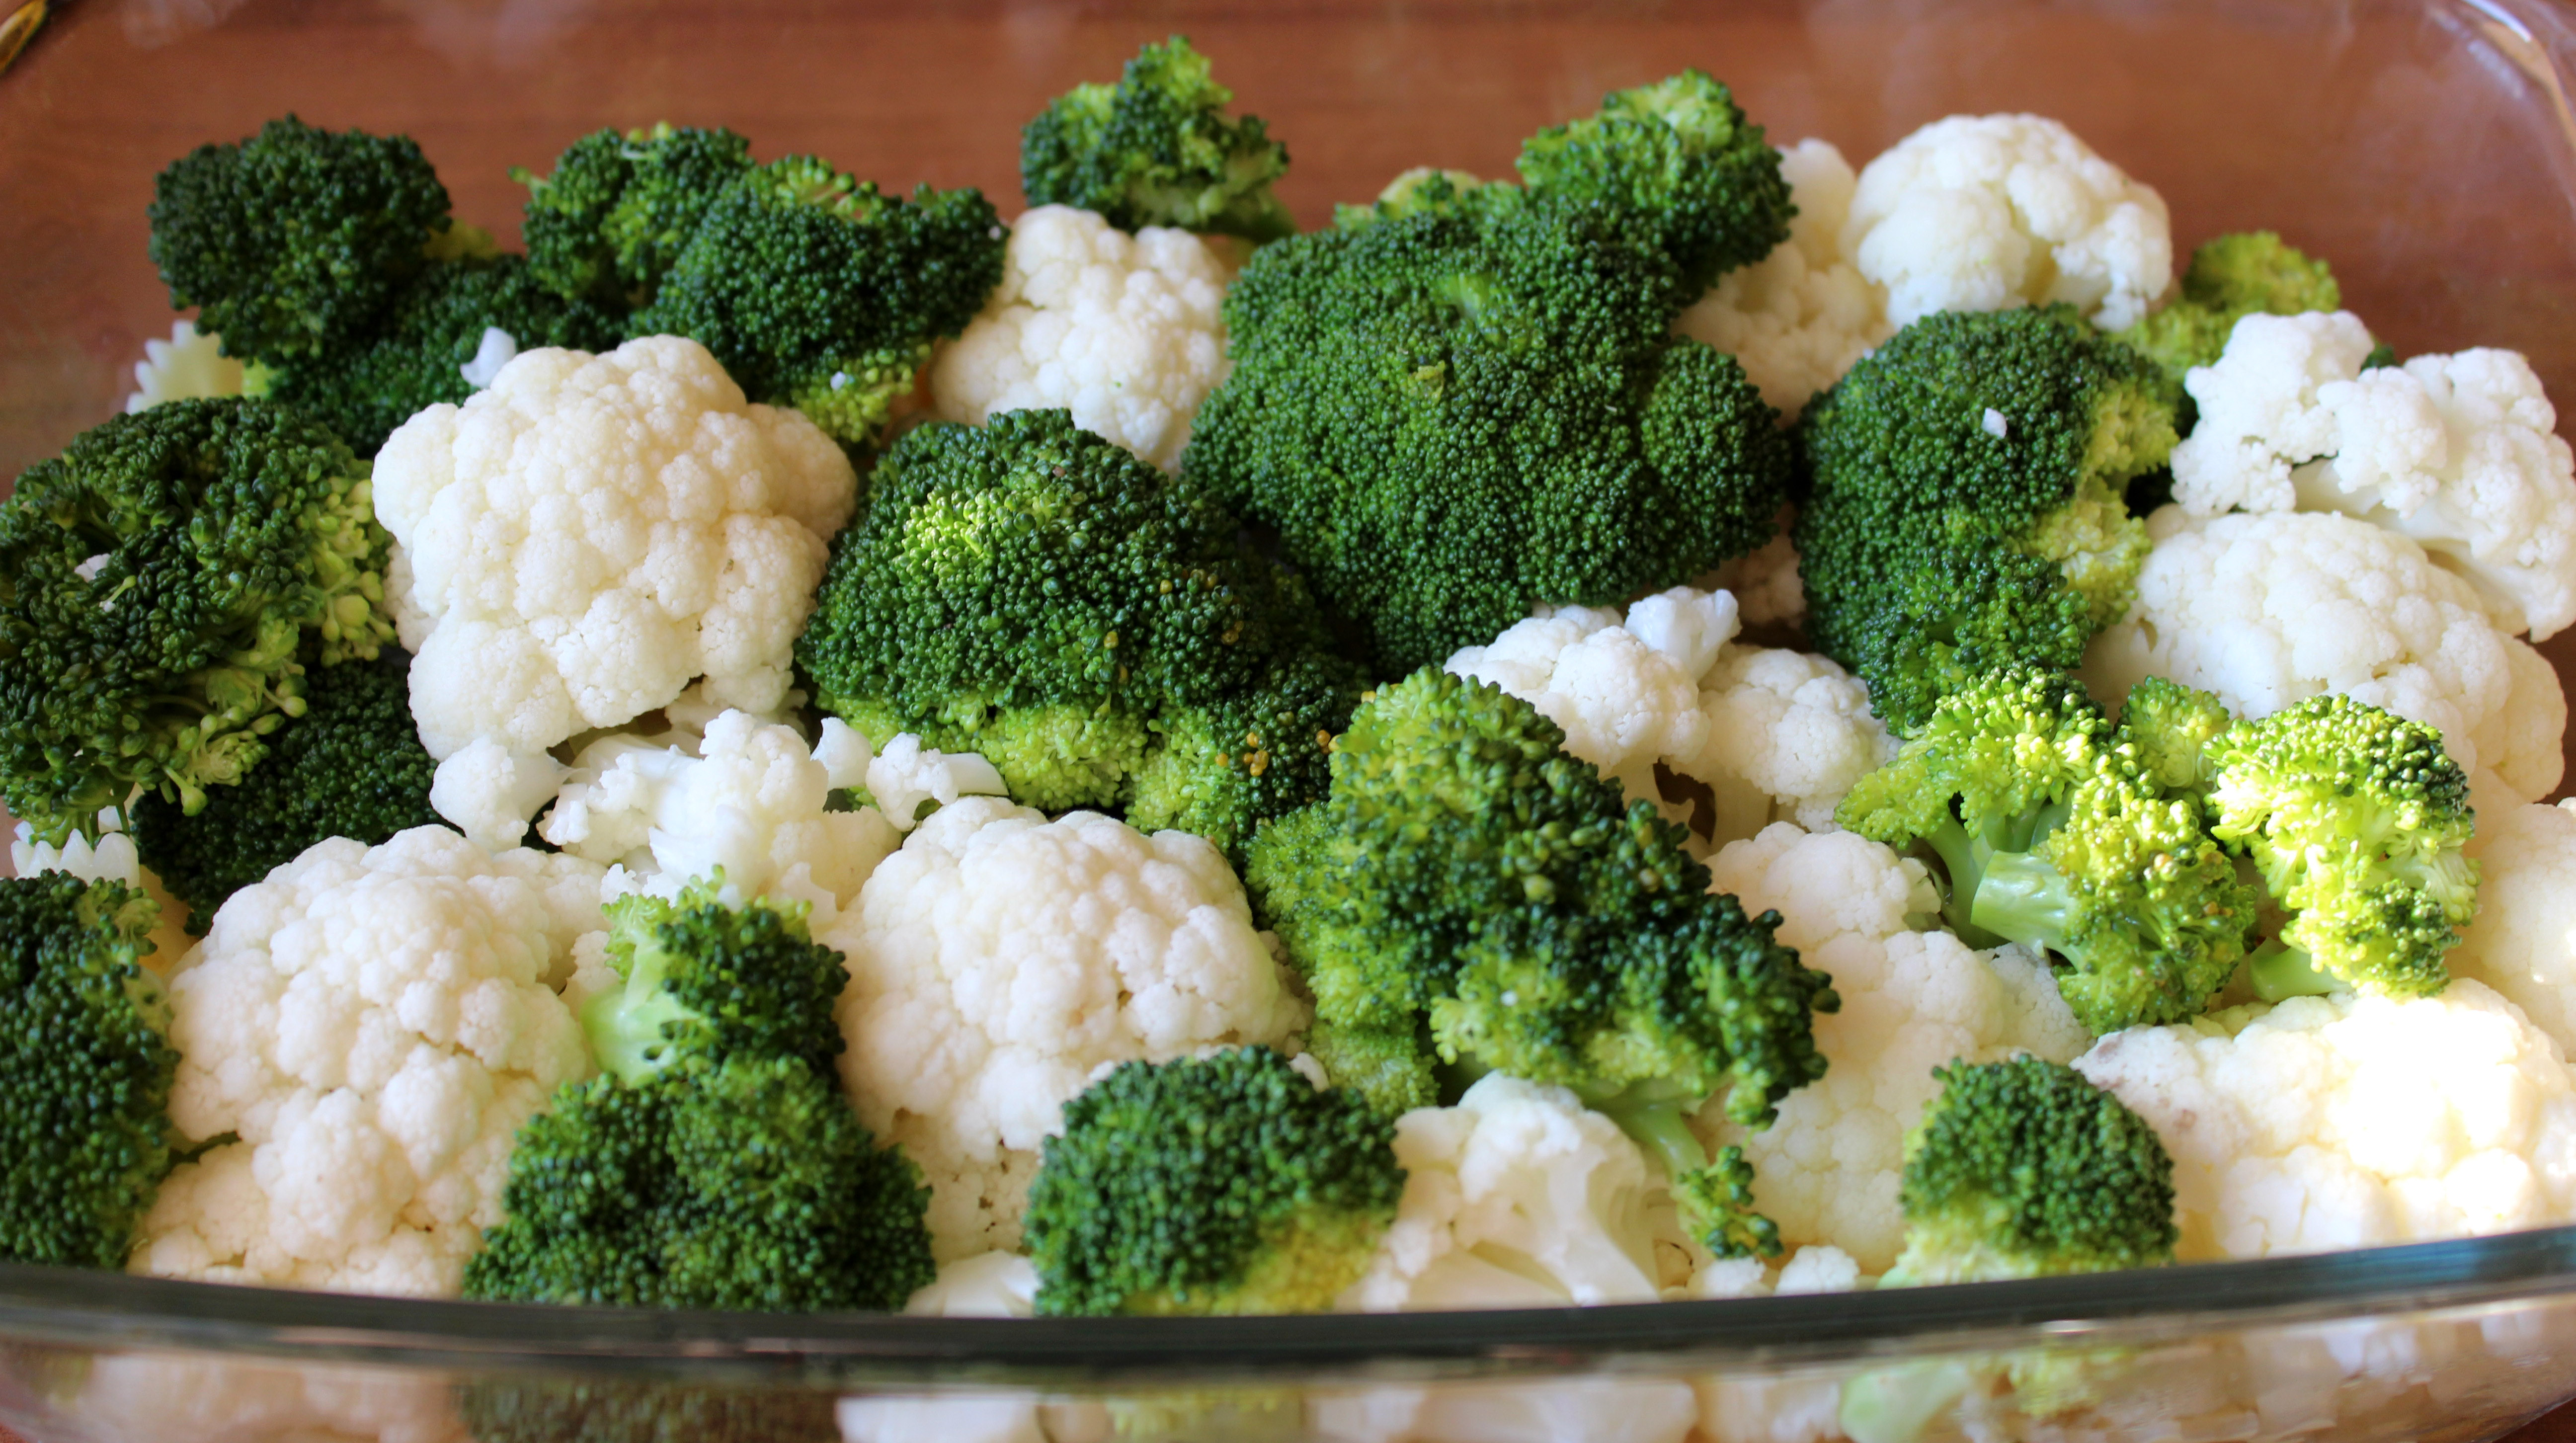 obiad kalafior brokuły